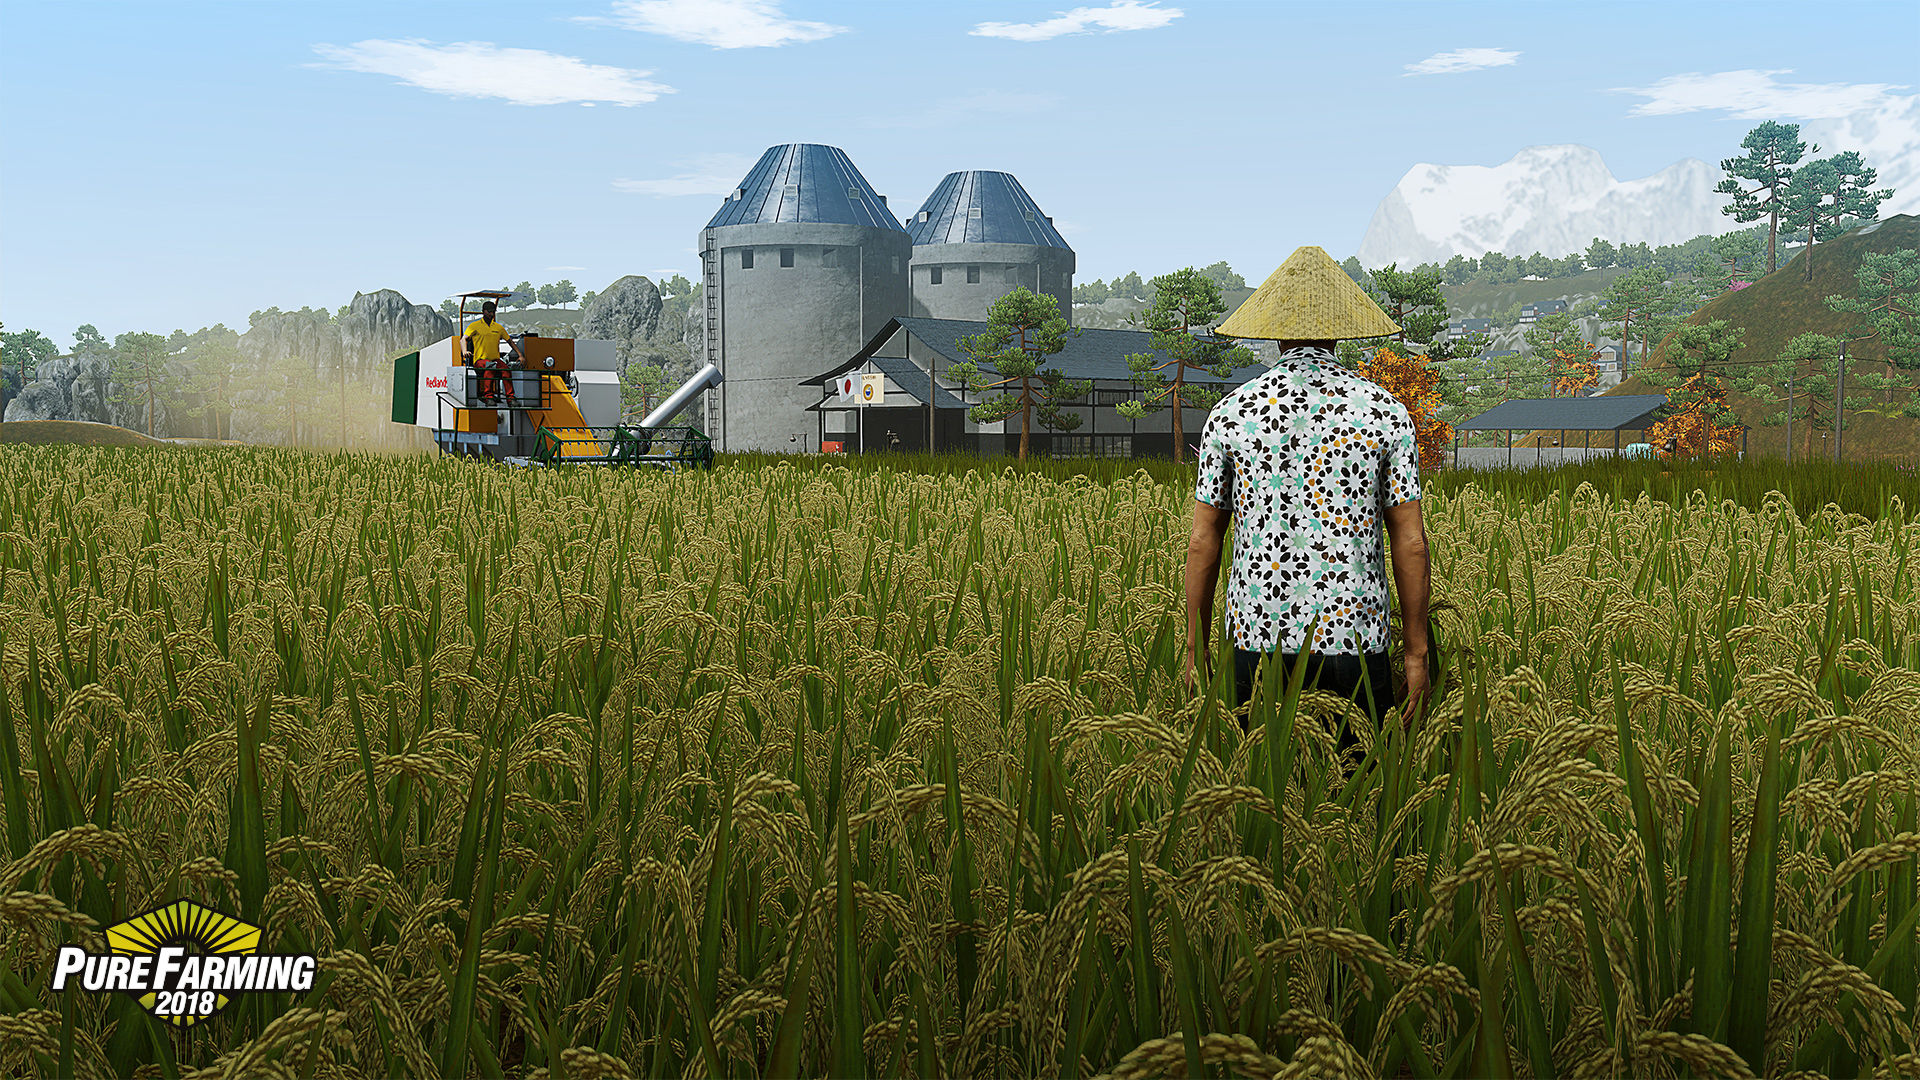 http://www.idgtv.es/archivos/201804/pure-farming-2018-img3.jpg